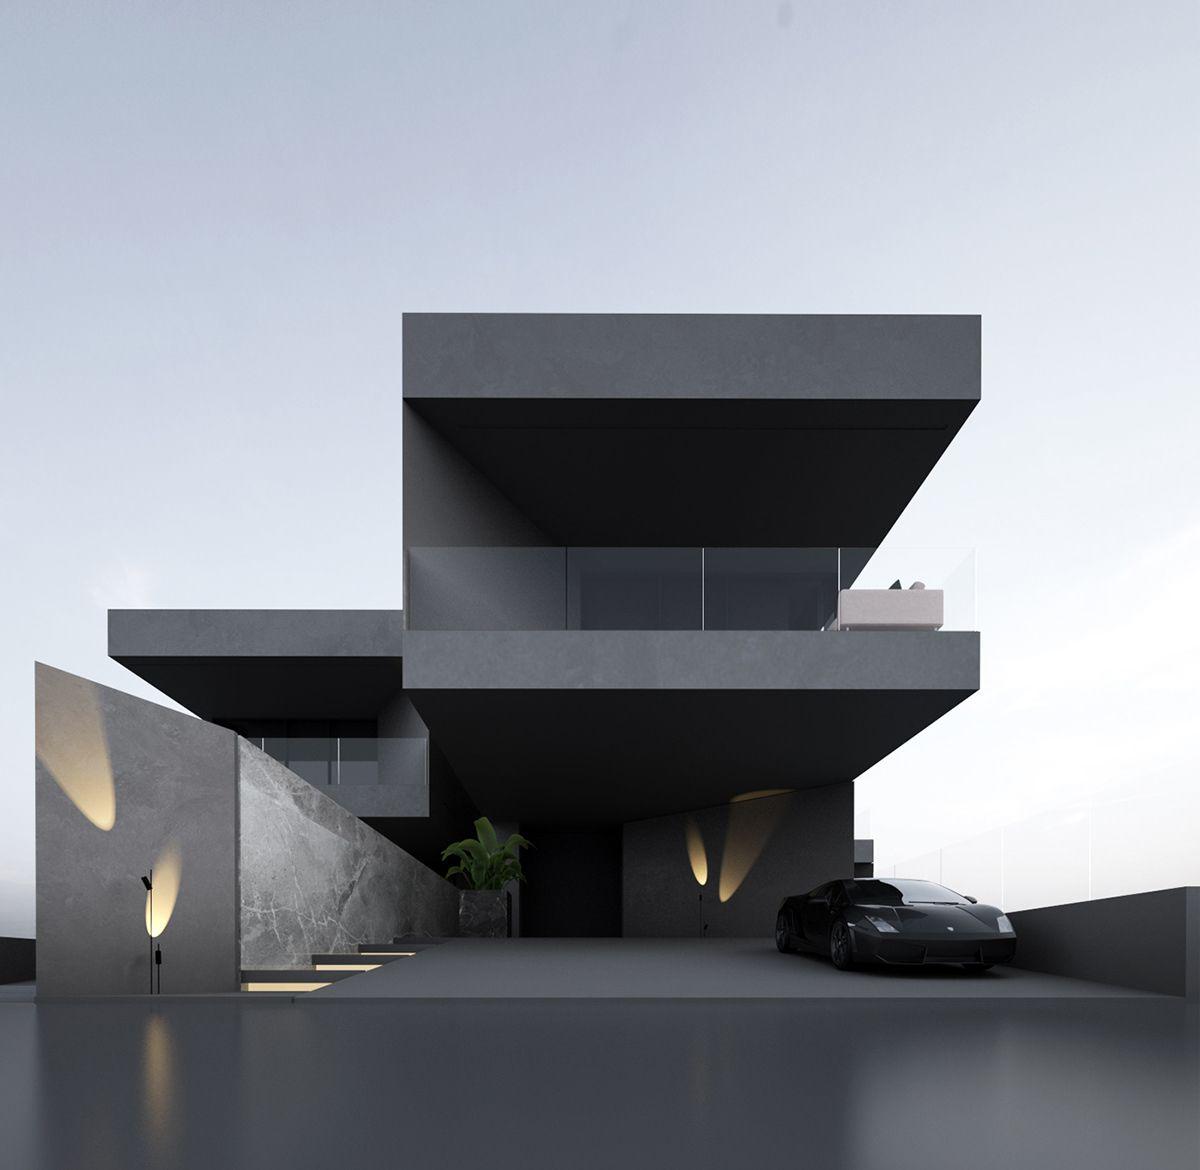 Project 705 On Behance 현대 주거 건축 콘테이너 하우스 집 외관